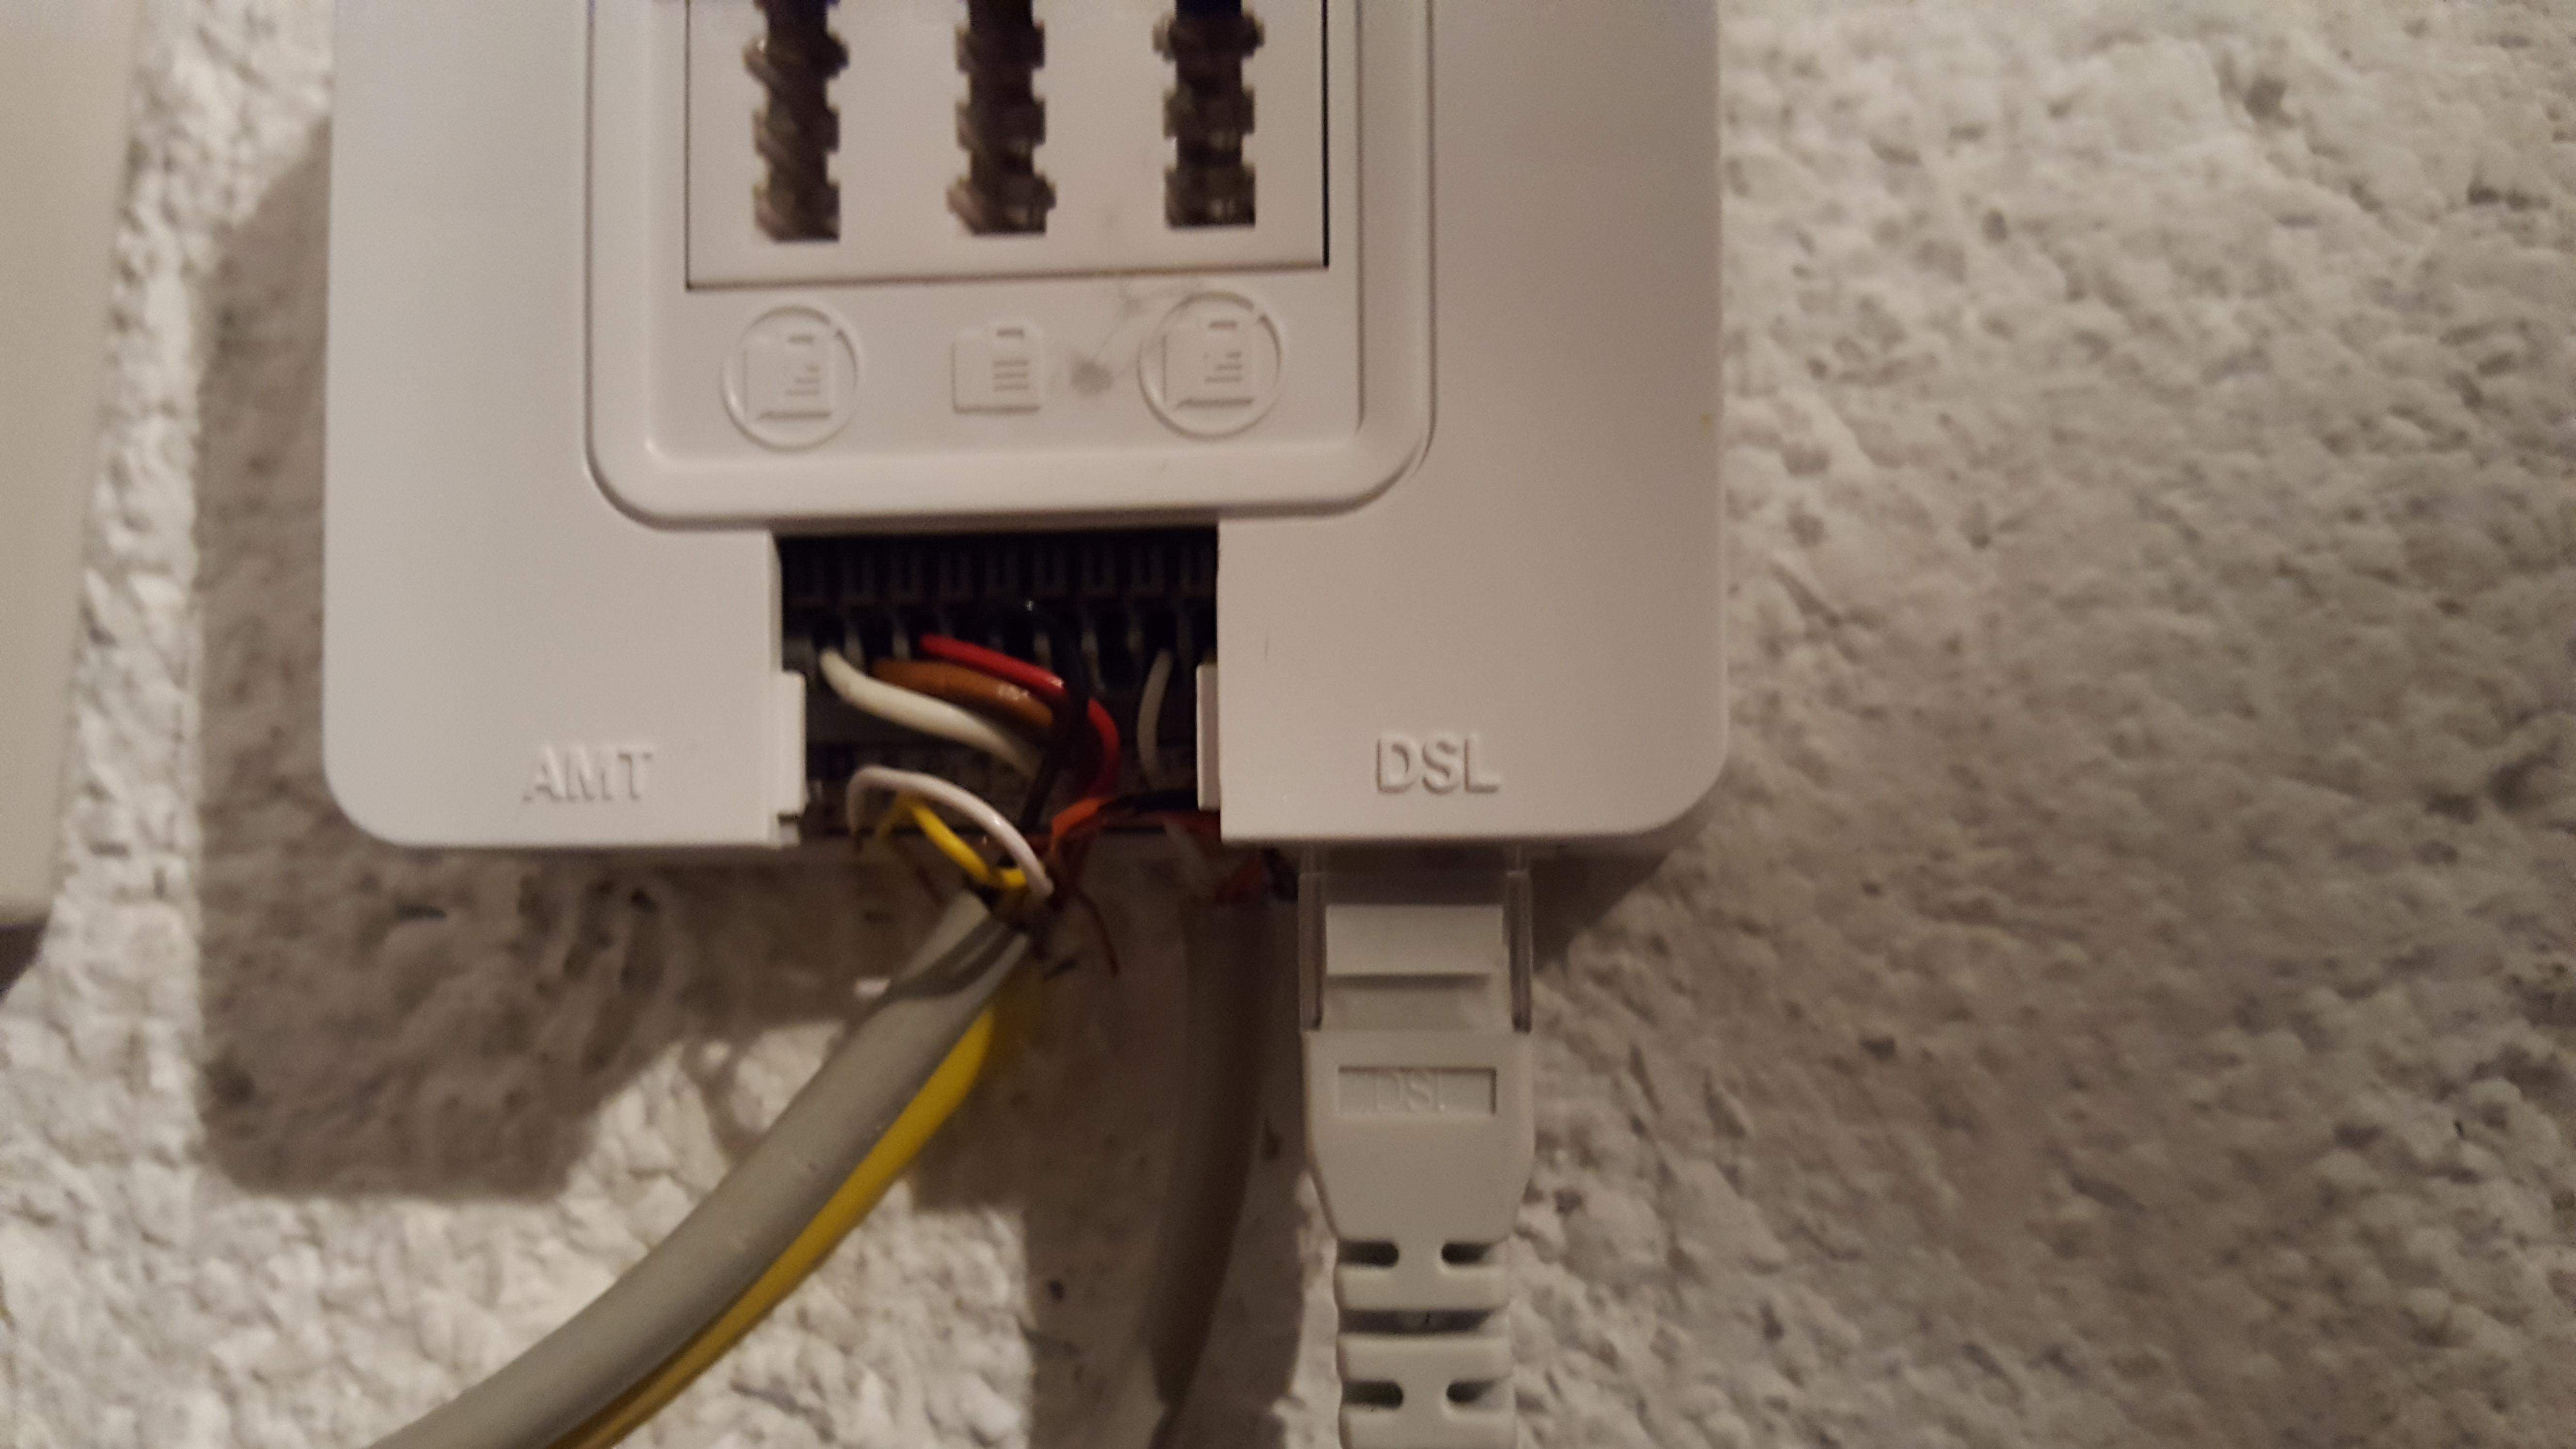 Telekom Splitter entfernen | ComputerBase Forum